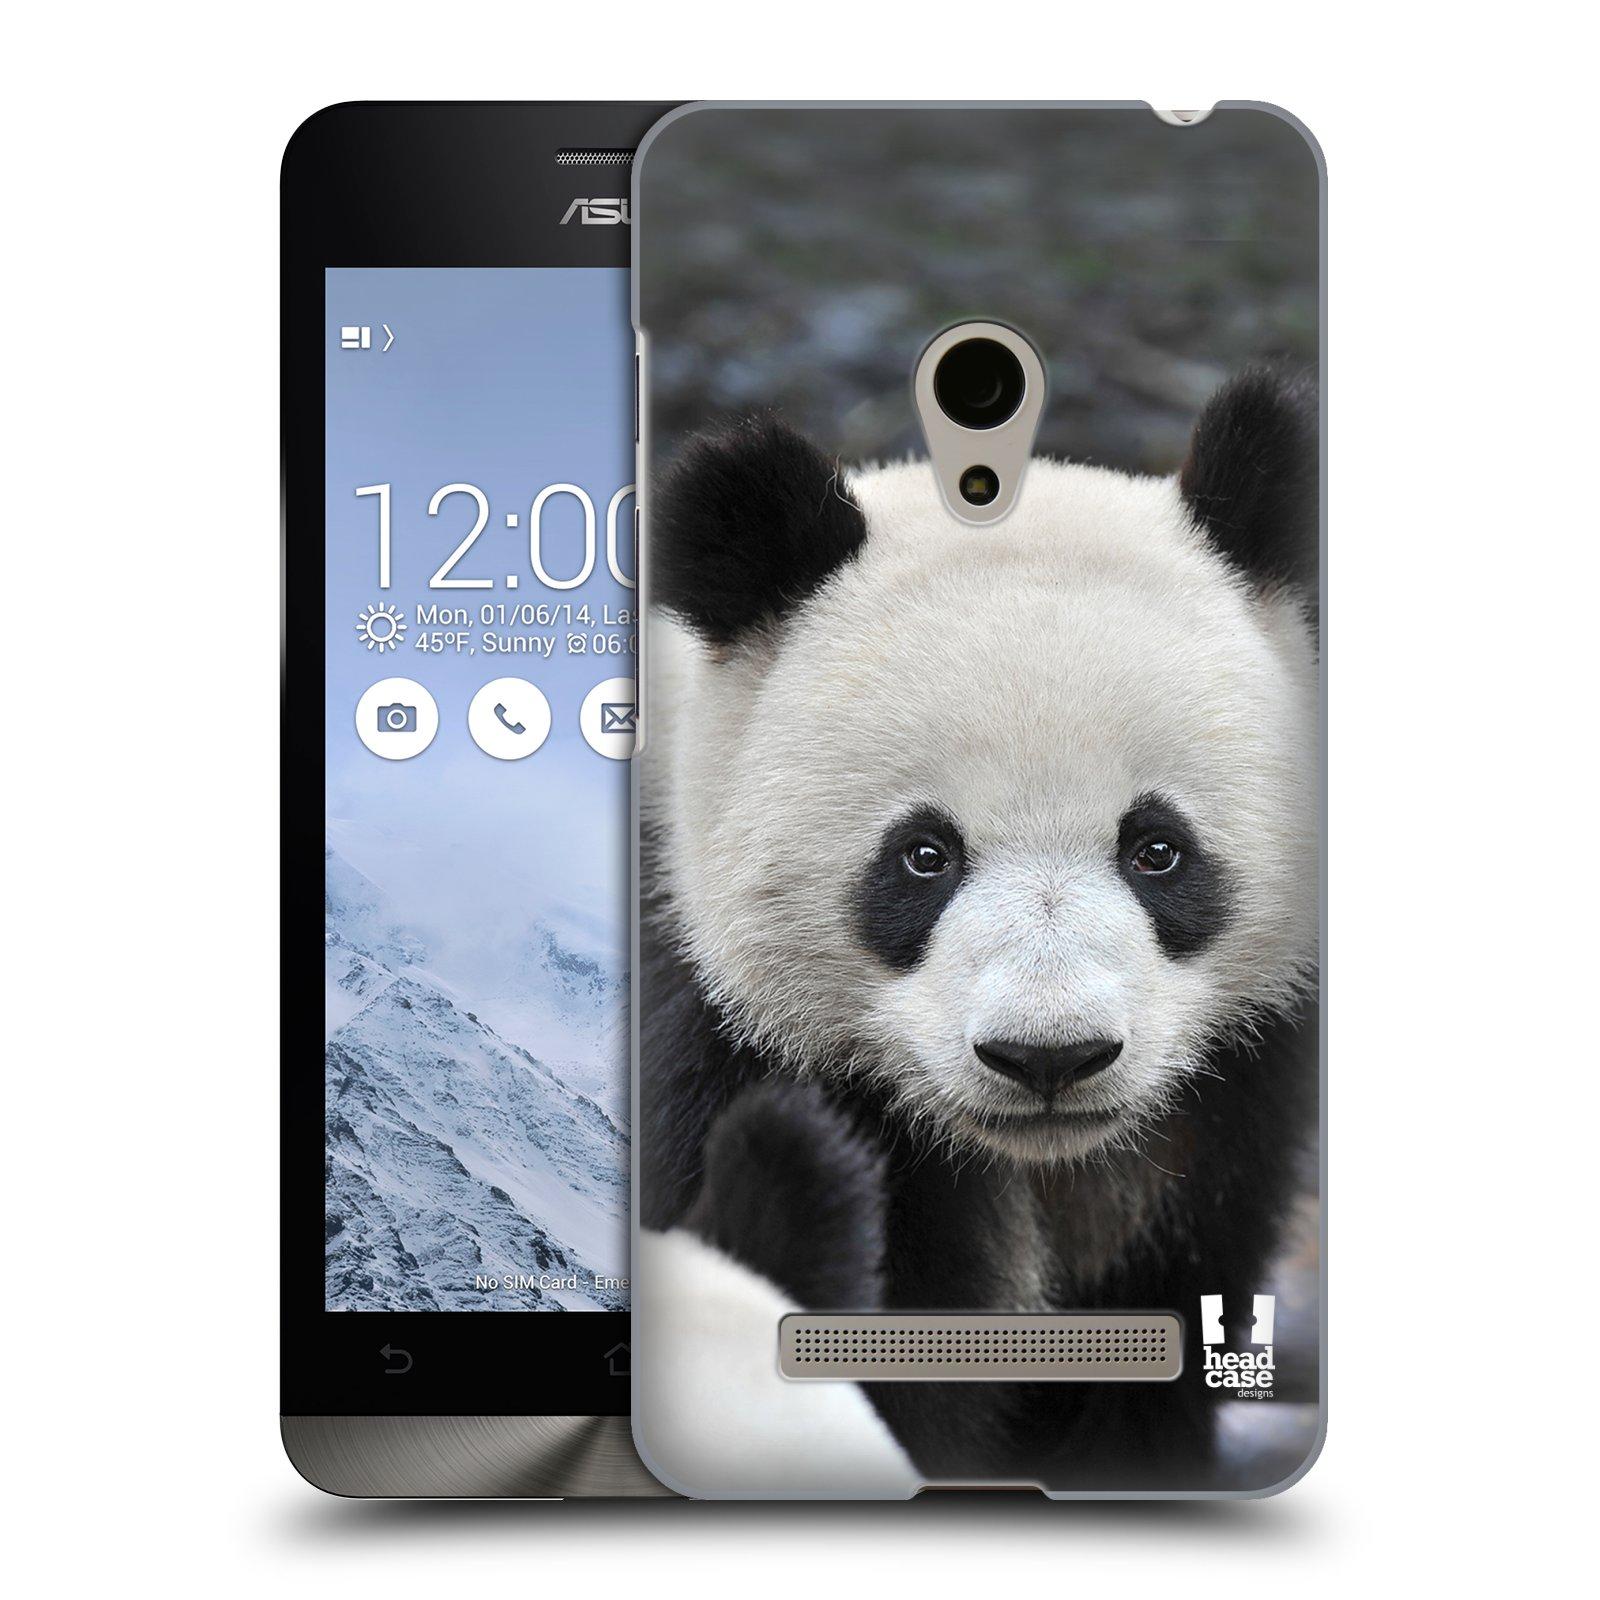 HEAD CASE plastový obal na mobil Asus Zenfone 5 vzor Divočina, Divoký život a zvířata foto MEDVĚD PANDA